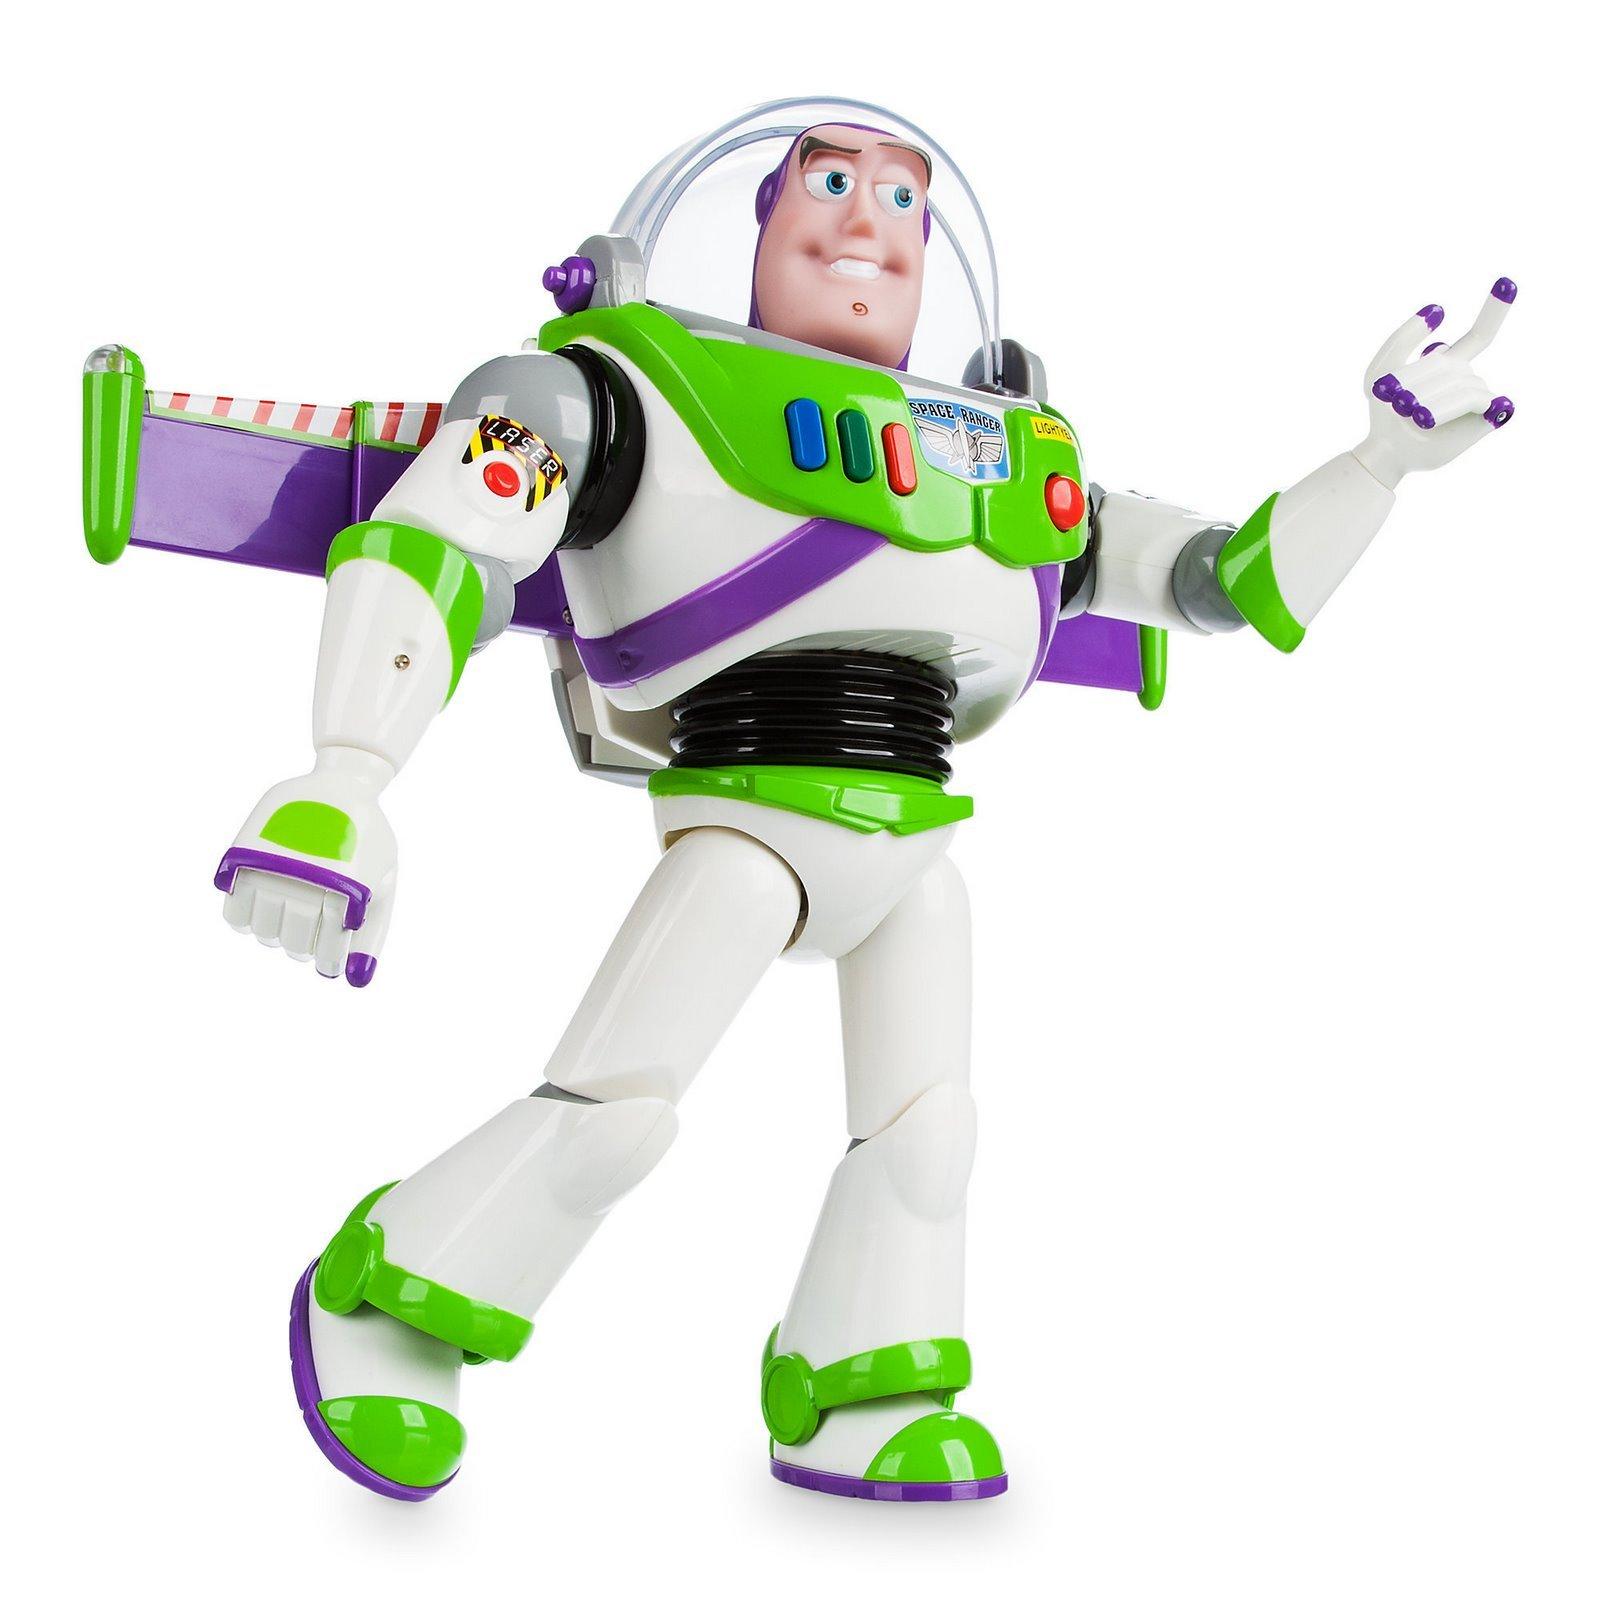 Каталог Базз Лайтер 30 см История игрушек (Buzz Lightyear) баз_лайтер_история_игрушек_01.jpg